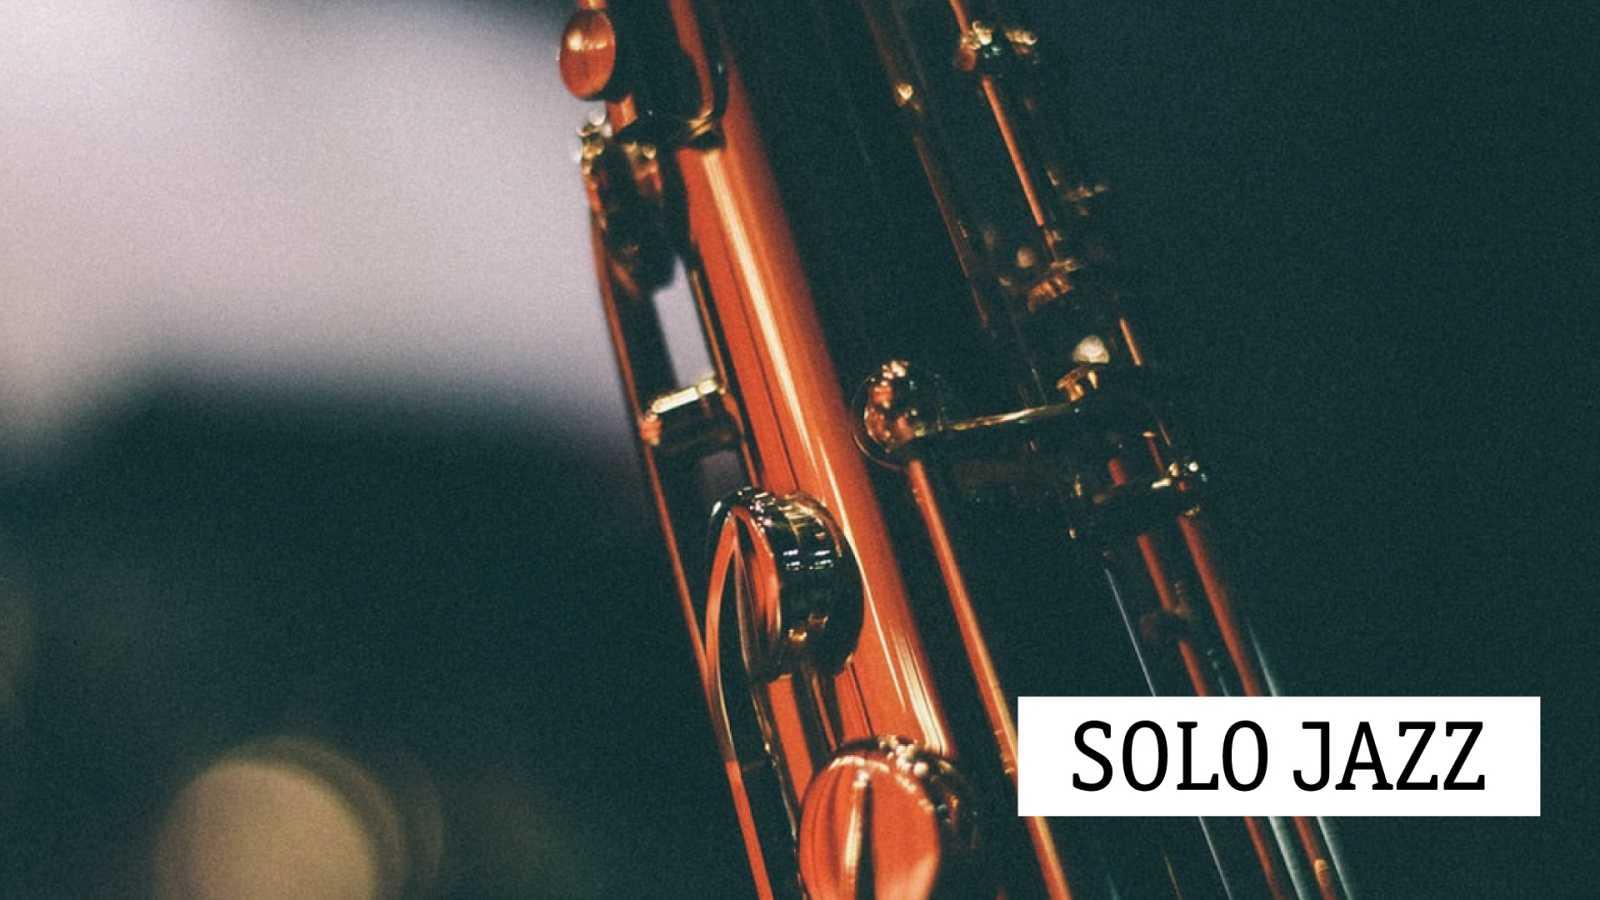 Solo jazz - Jim Hall & Red Mitchell, una auténtica delicatessen  - 23/04/21 - escuchar ahora